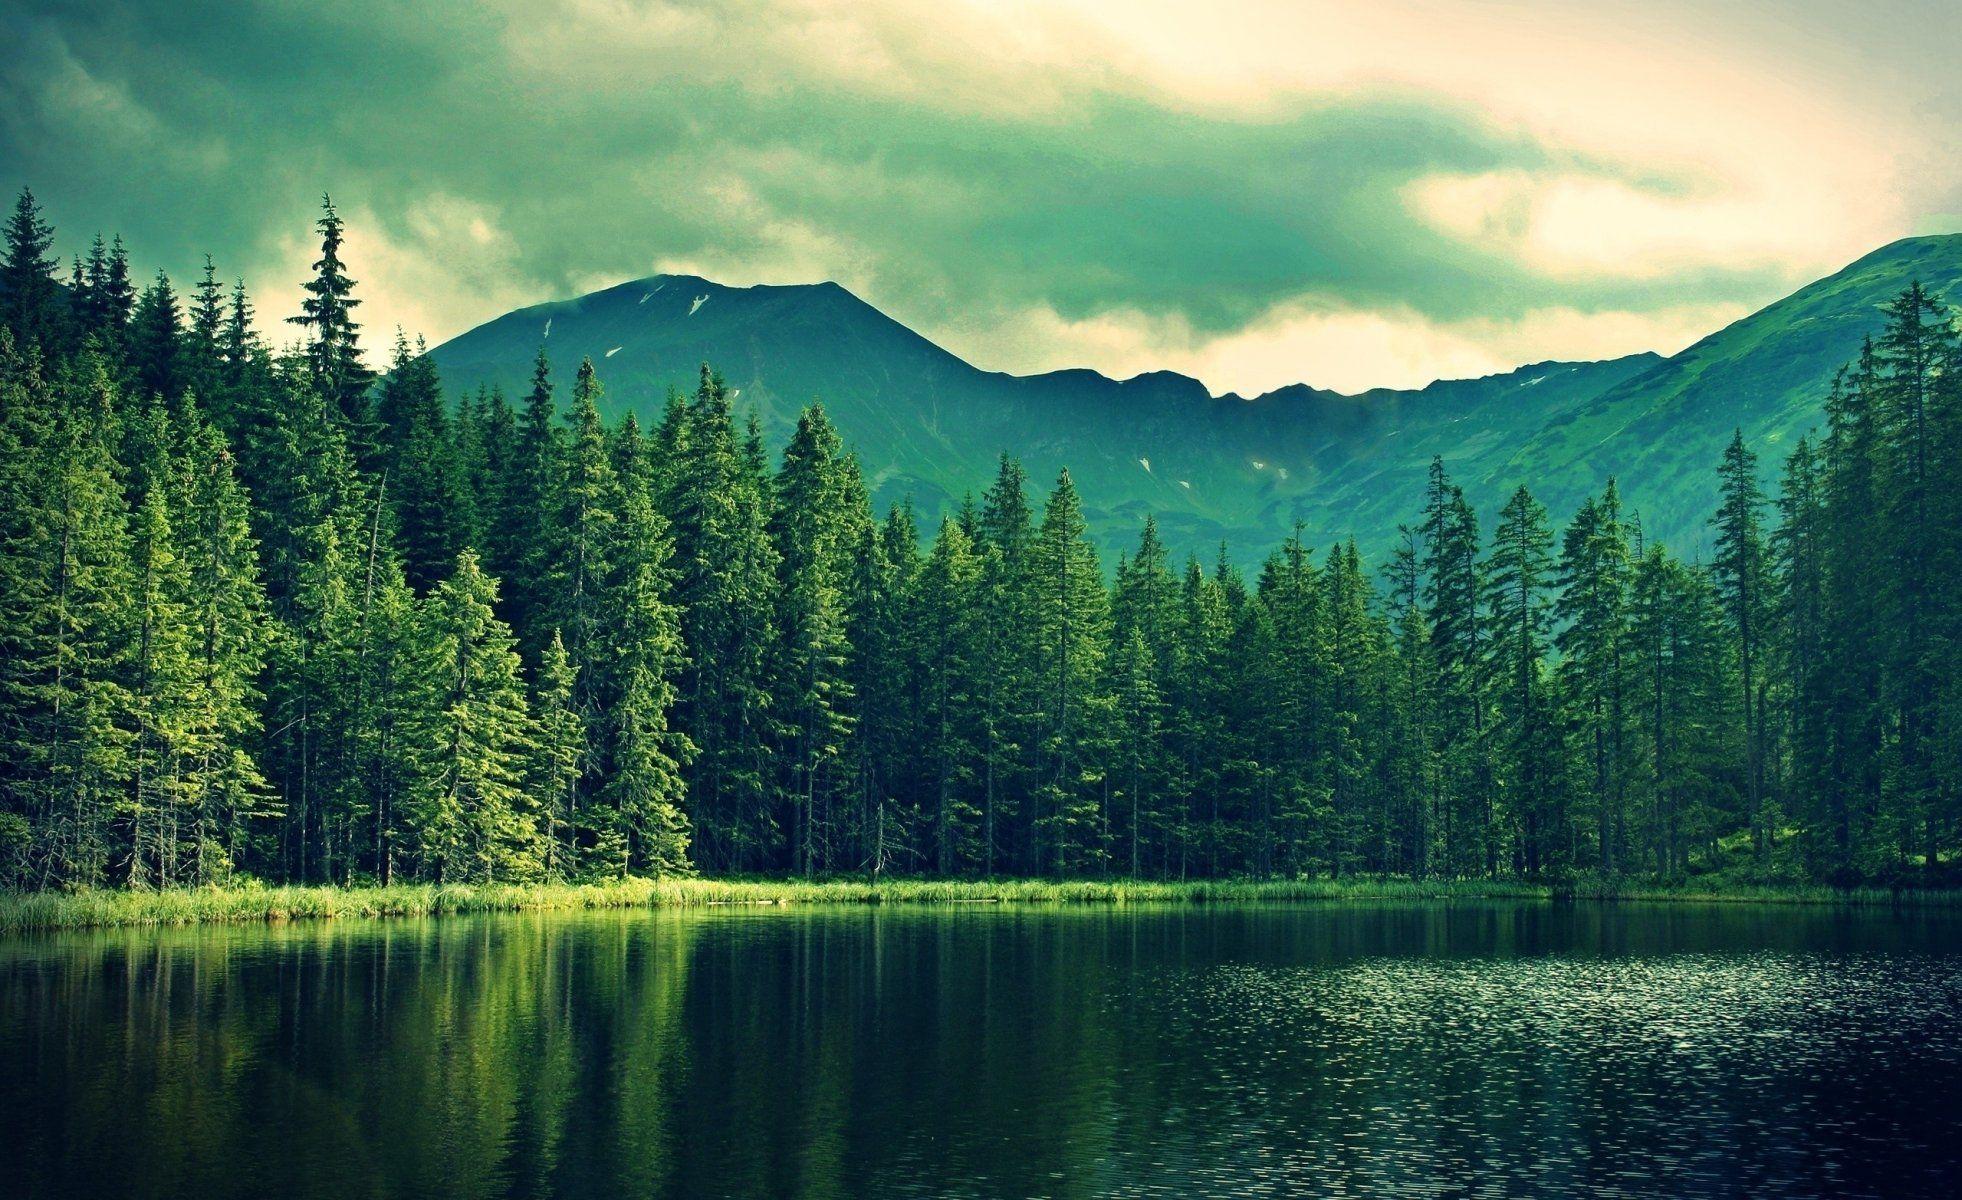 Nature Forest Mountain Lake Rain Fishing Beautiful Hd Wallpaper Landscape Wallpaper Lake Landscape Mountain Landscape